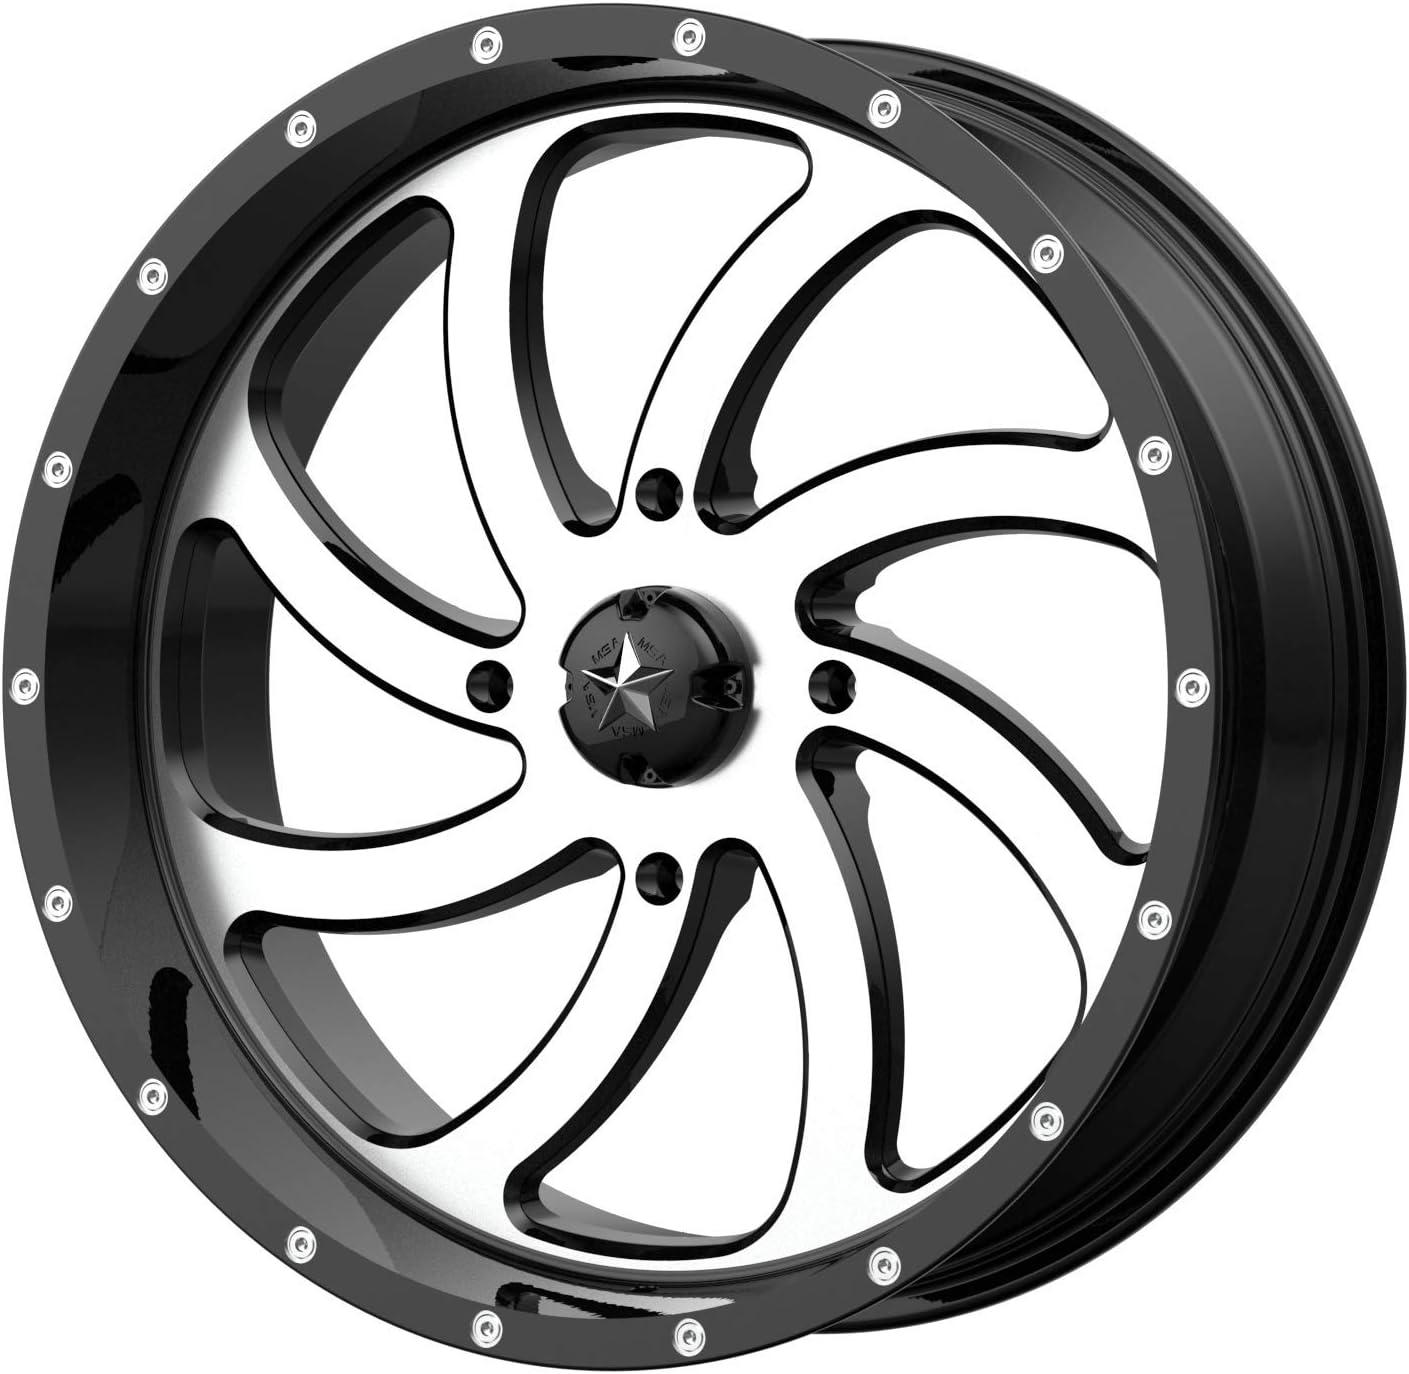 MSA M36 Switch 18x7 ATV UTV Wheel M36-0 Machined Max 67% OFF Beauty products +0mm 156 4 -